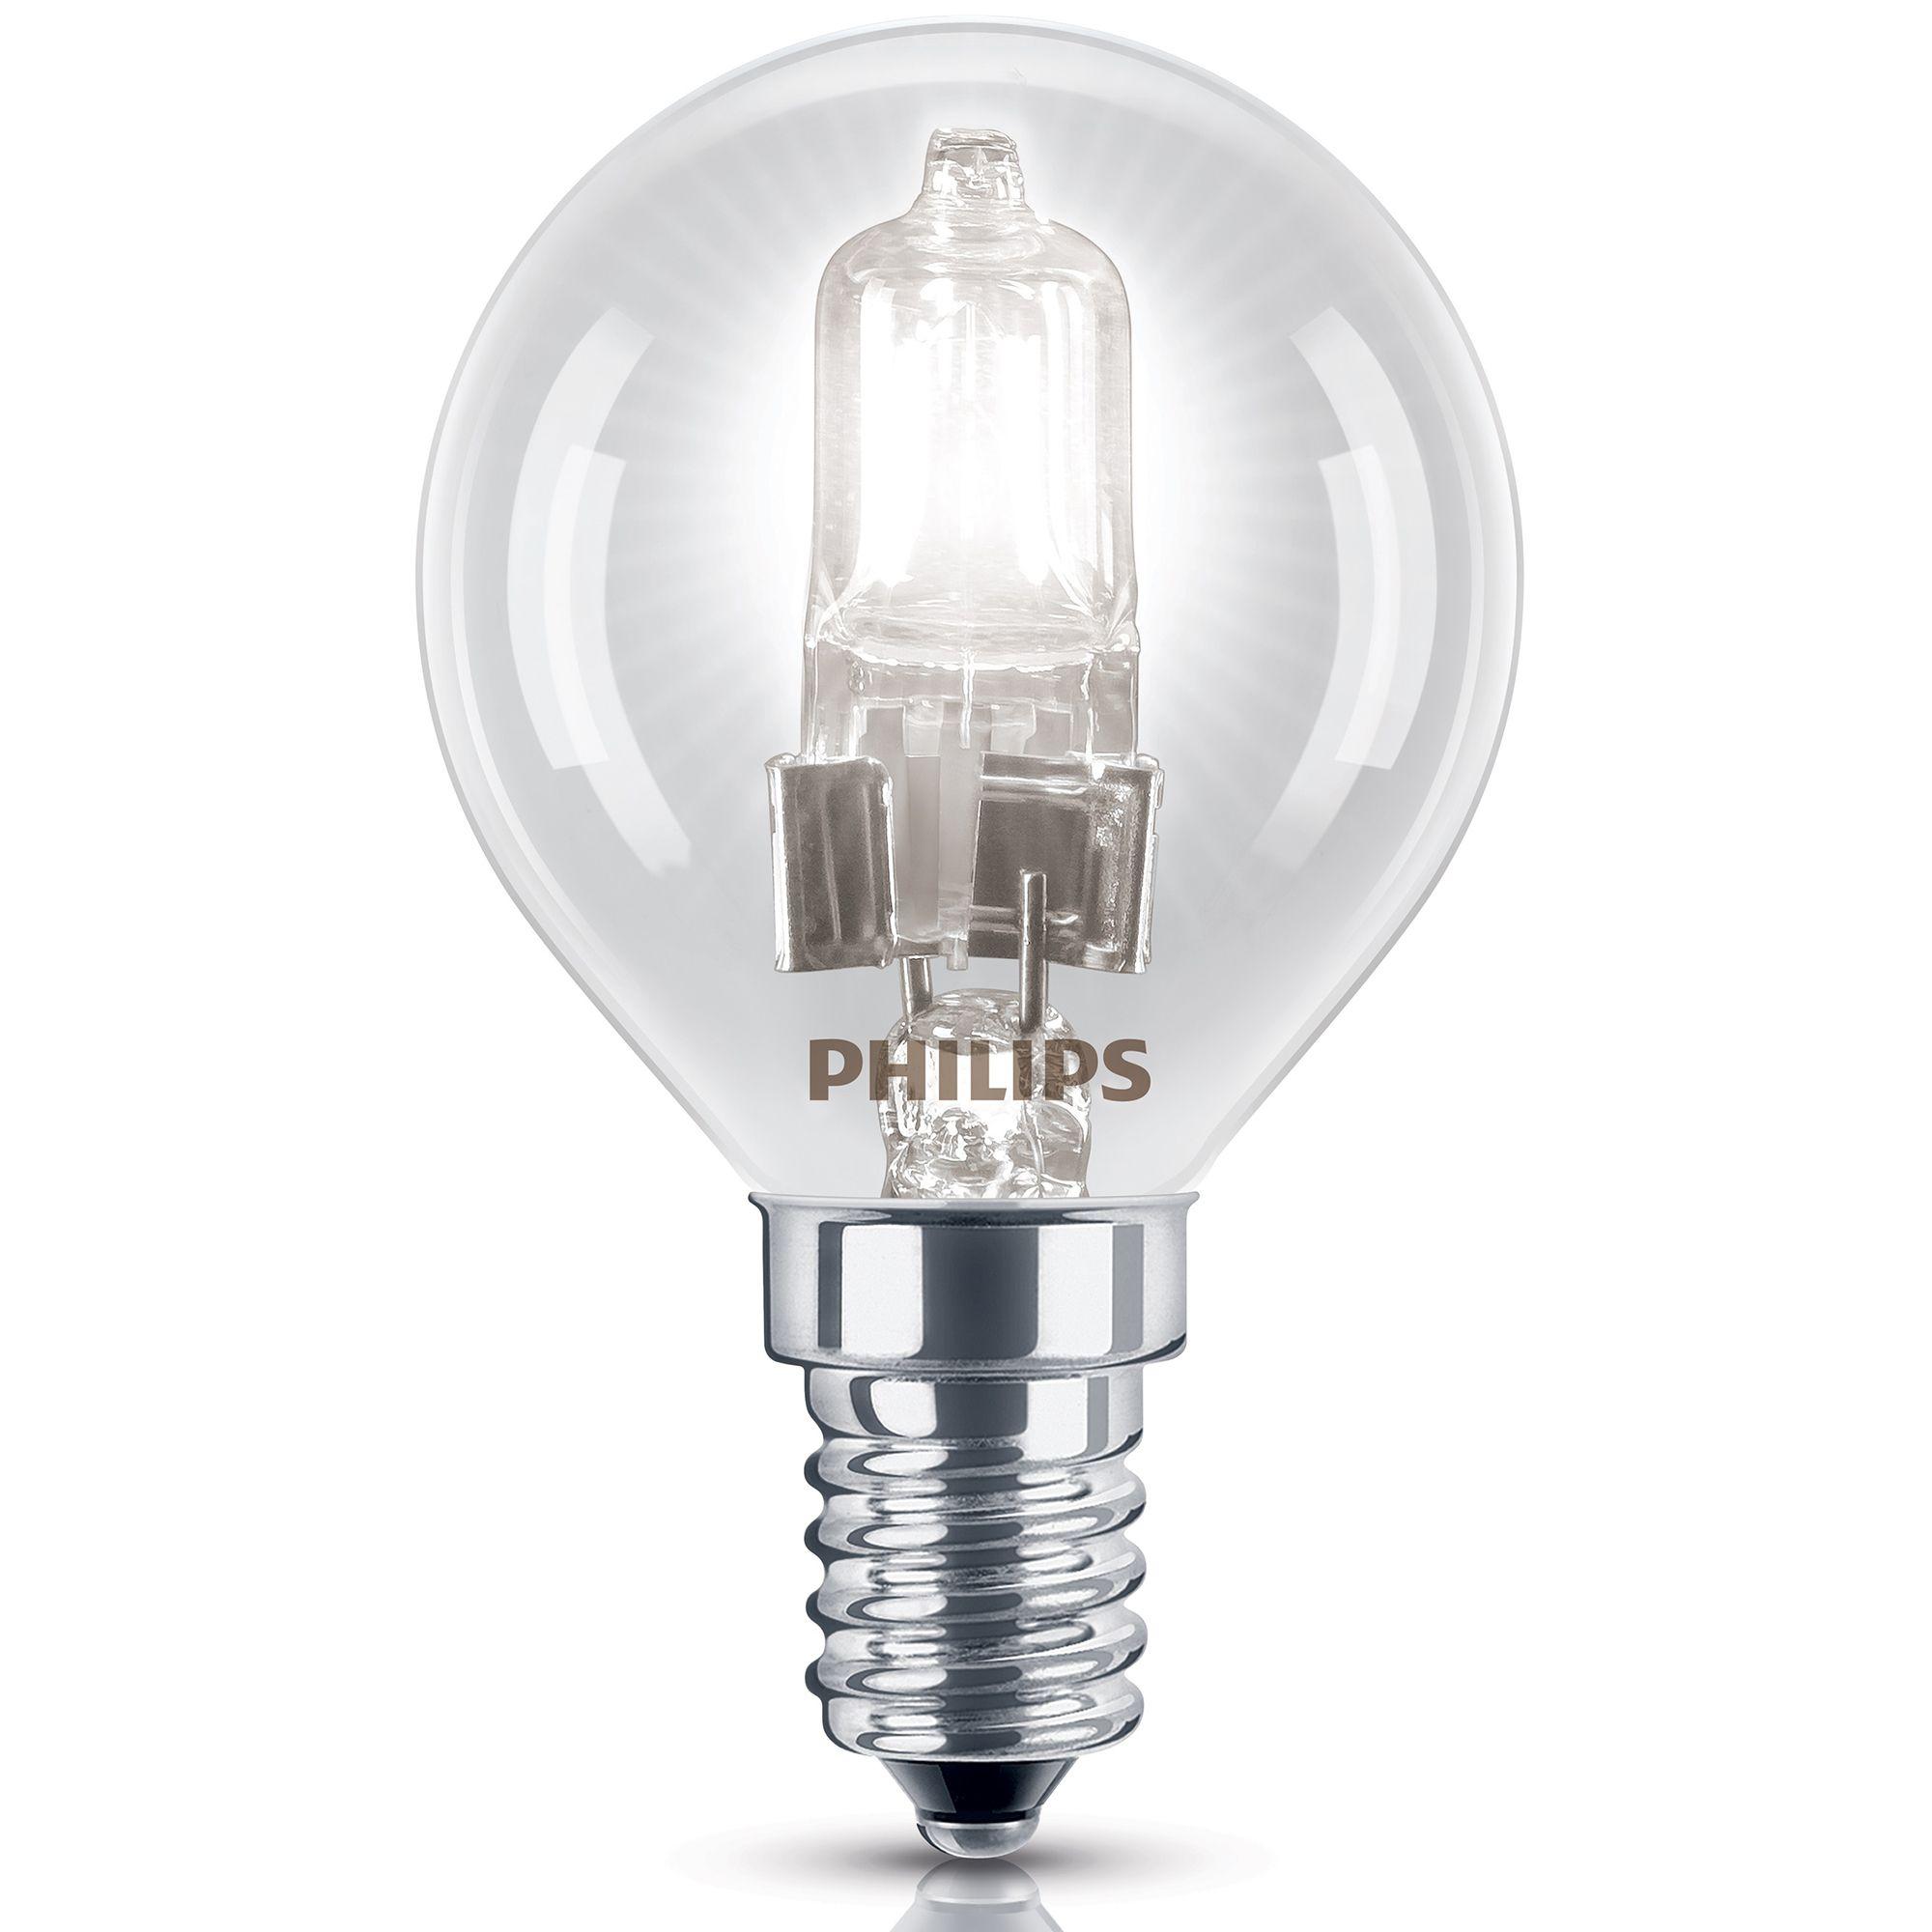 Philips E14 42w Halogen Dimmable Ball Light Bulb